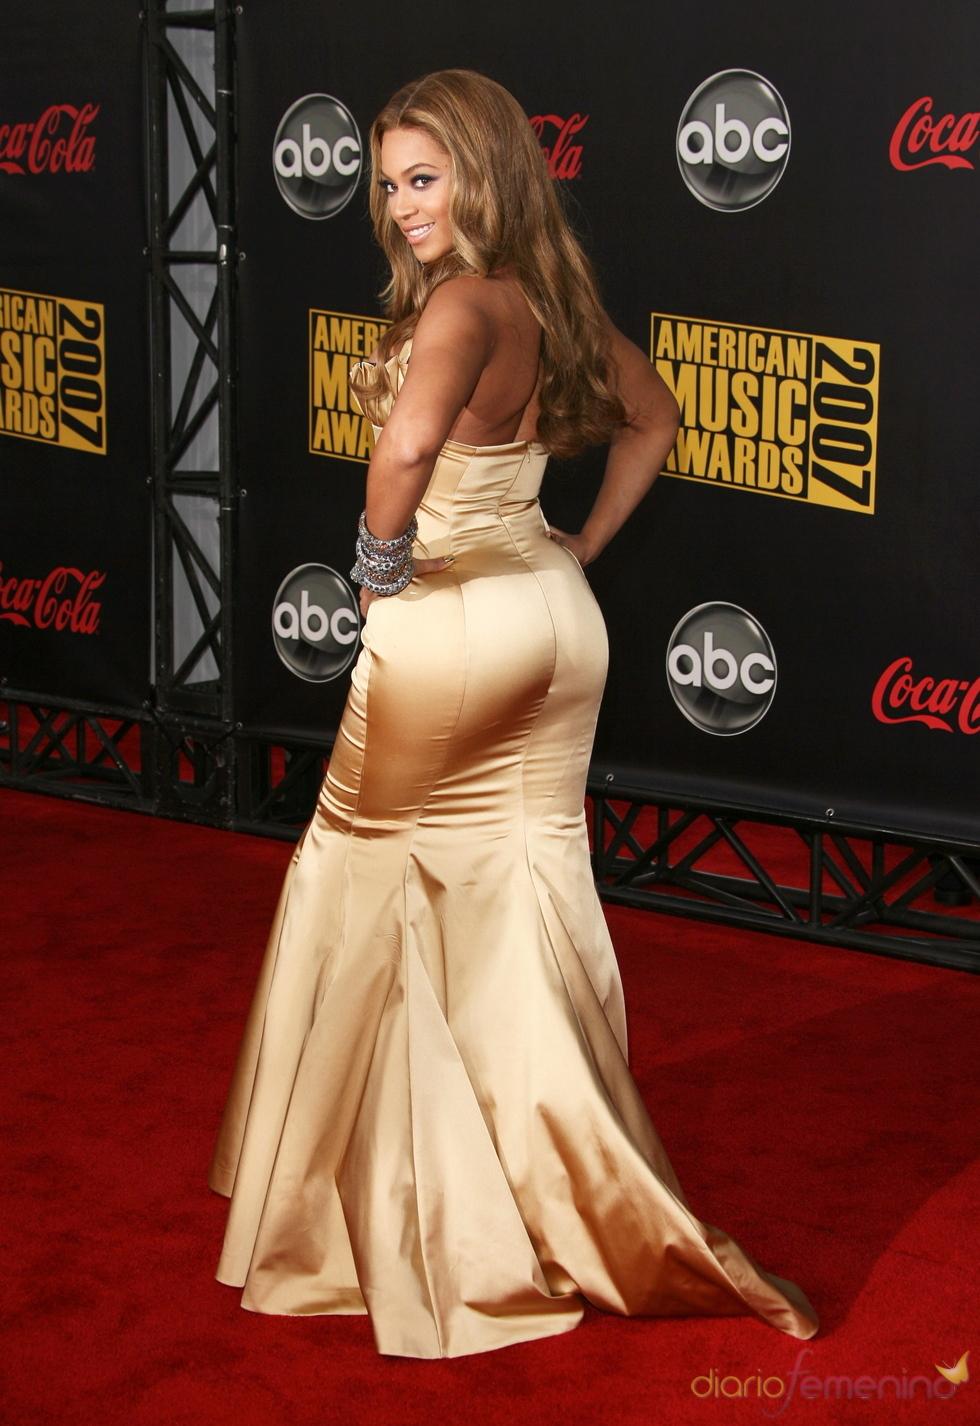 A Beyoncé no le importa mostrar sus curvas